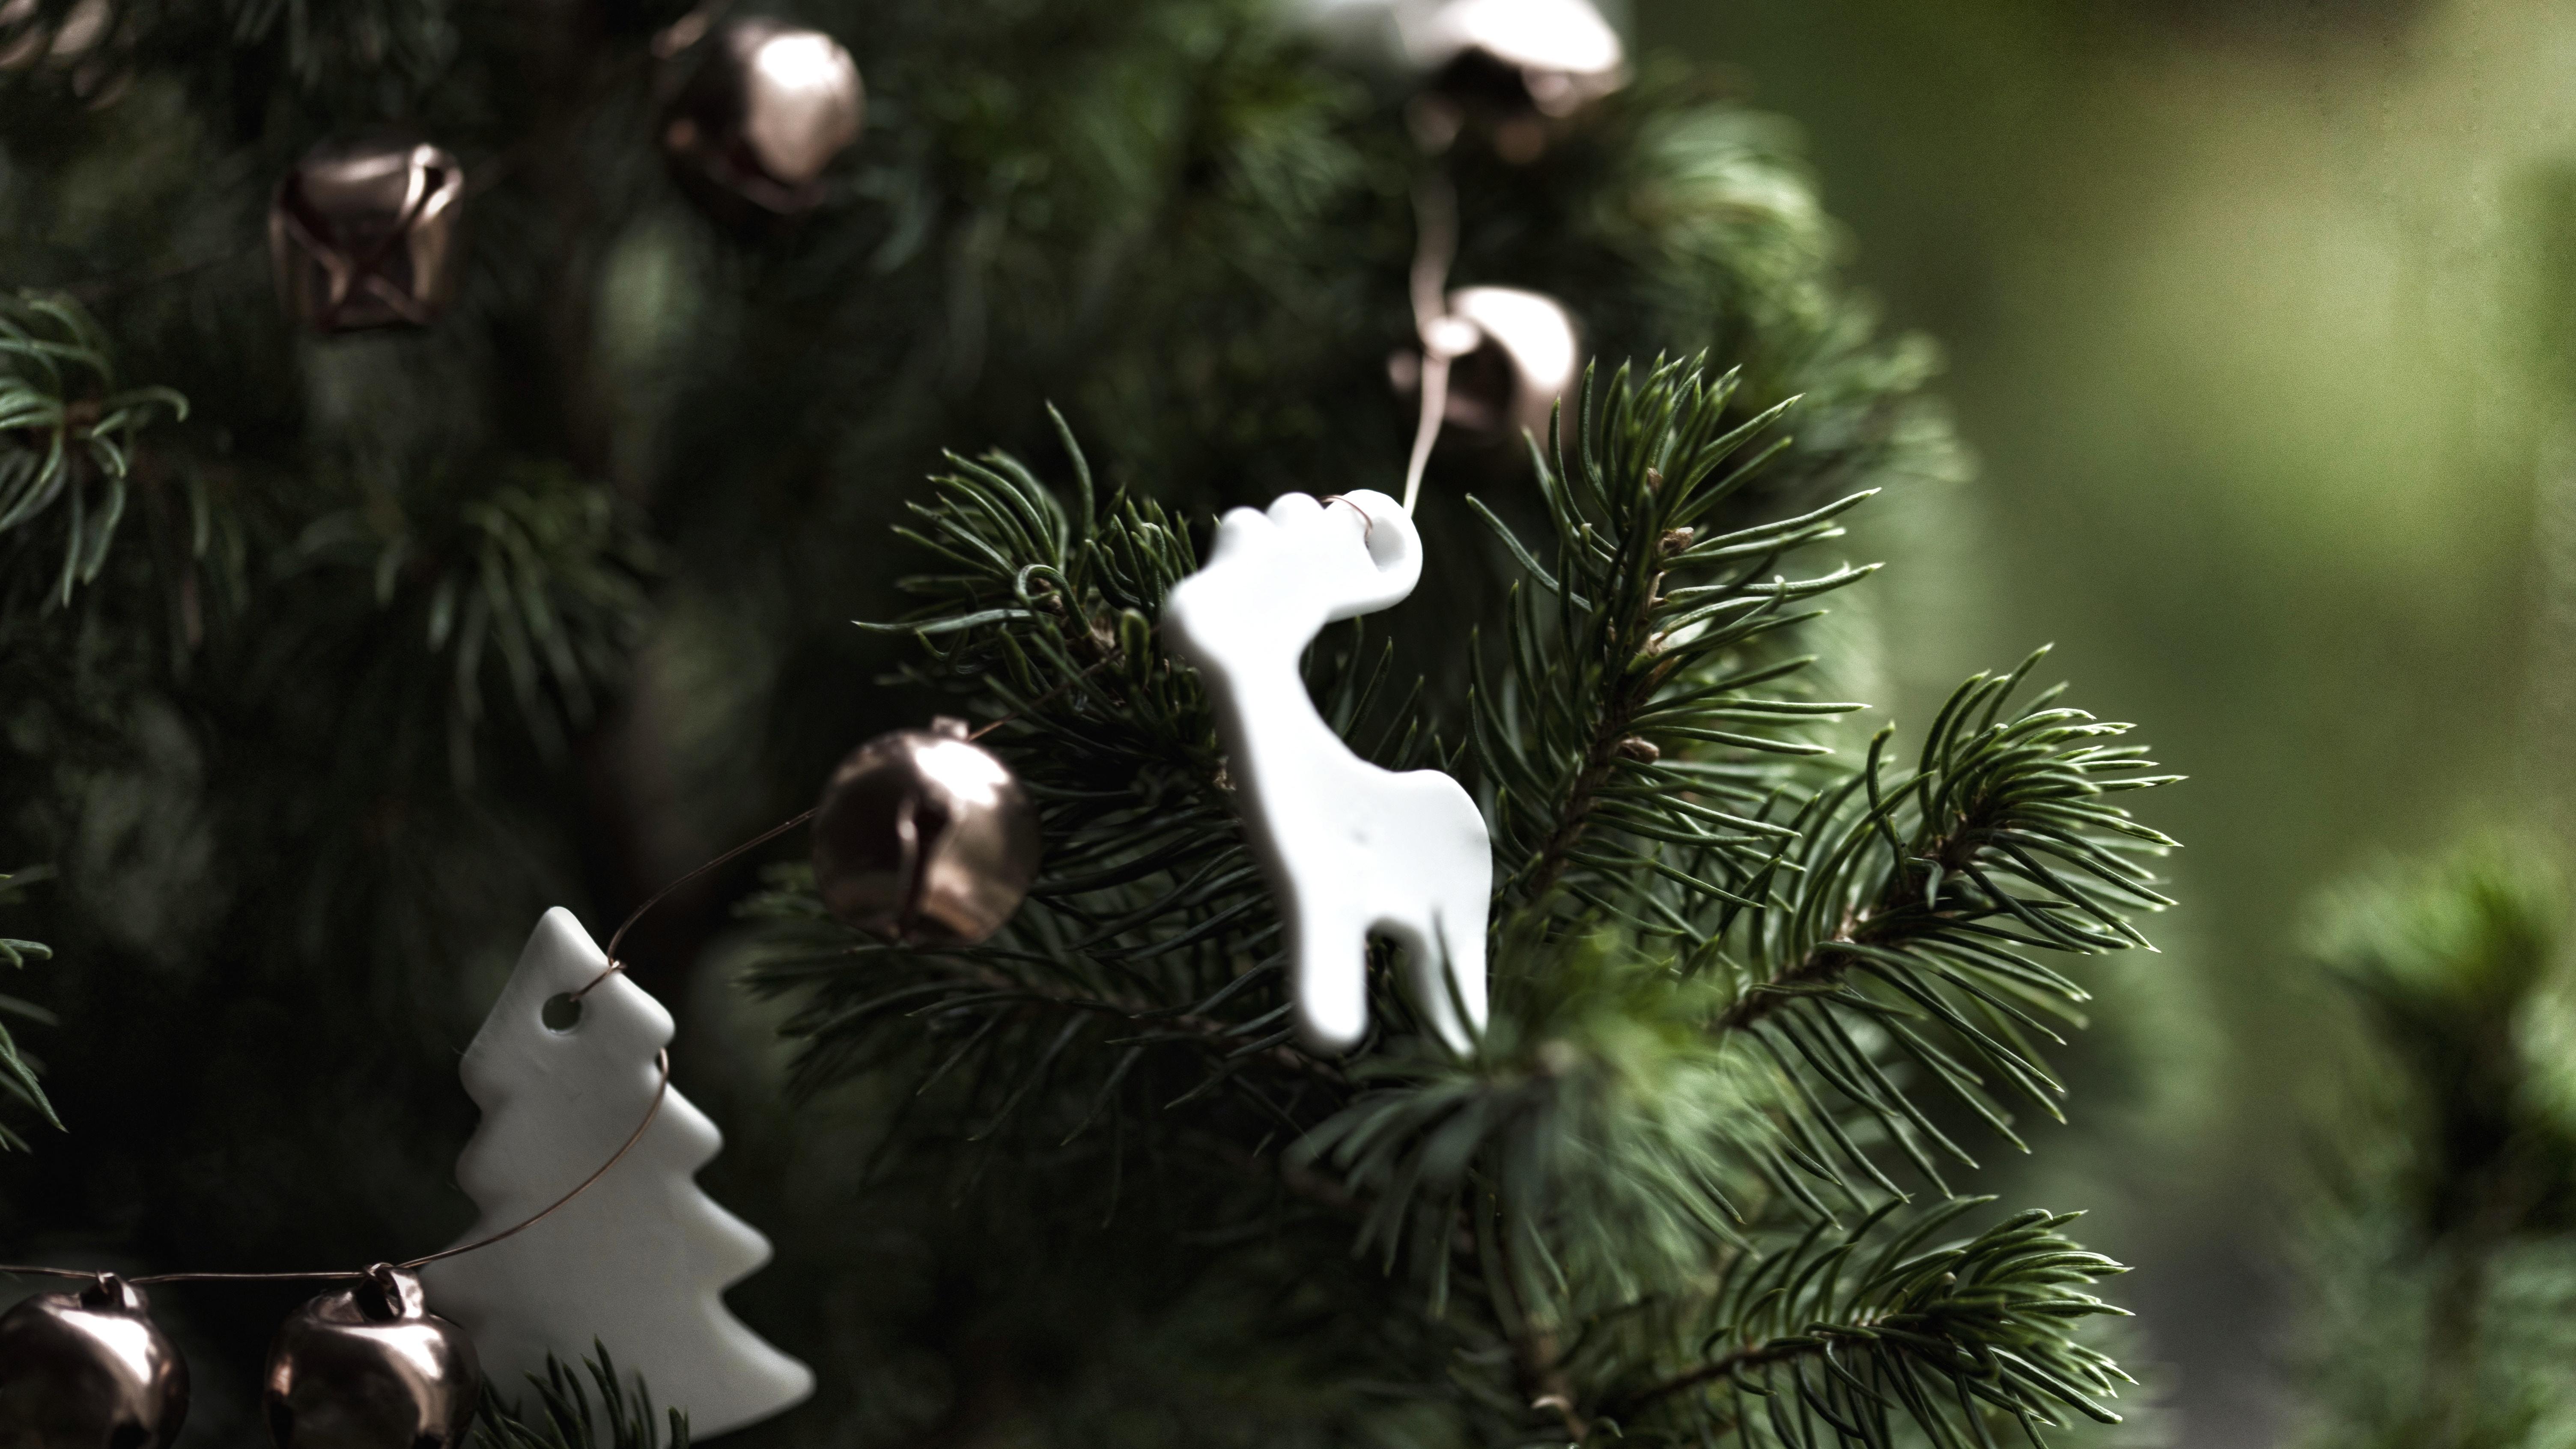 Por onde anda o verdadeiro espírito de Natal? The Minimal Magazine